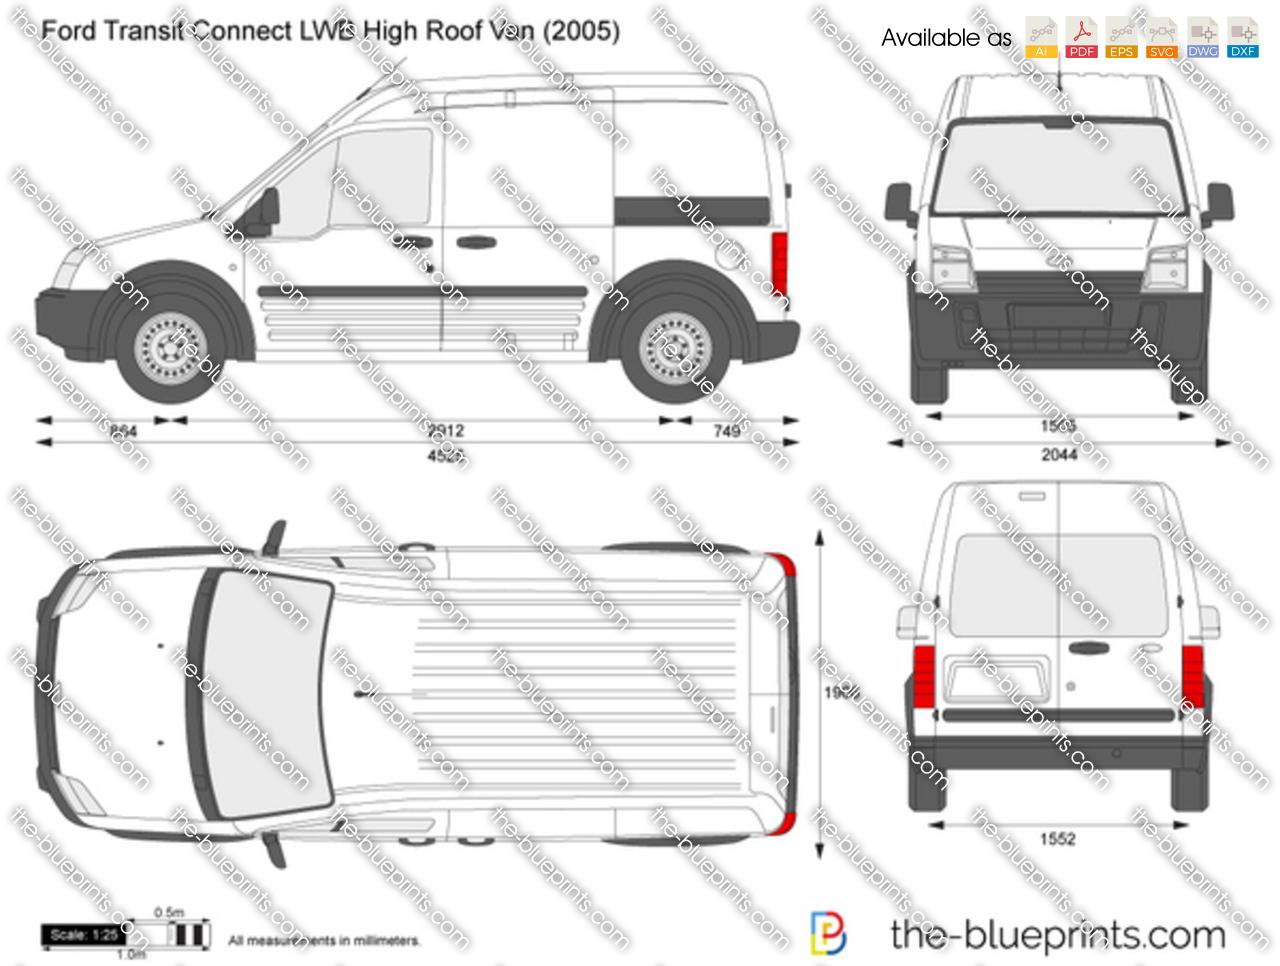 ford transit connect lwb high roof van vector drawing. Black Bedroom Furniture Sets. Home Design Ideas